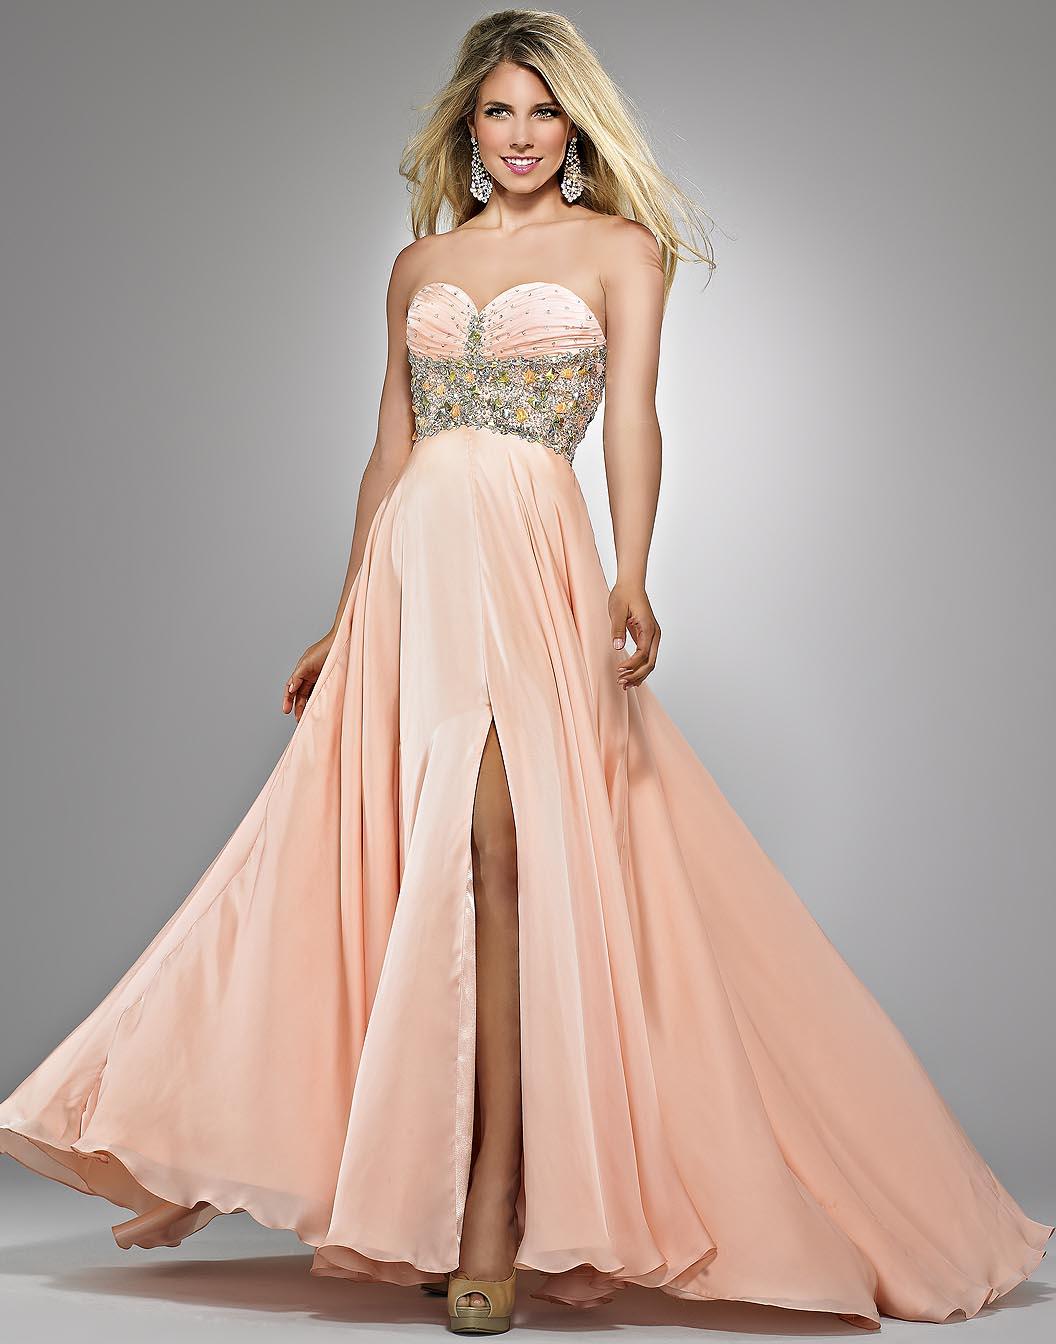 Prom dresses mass